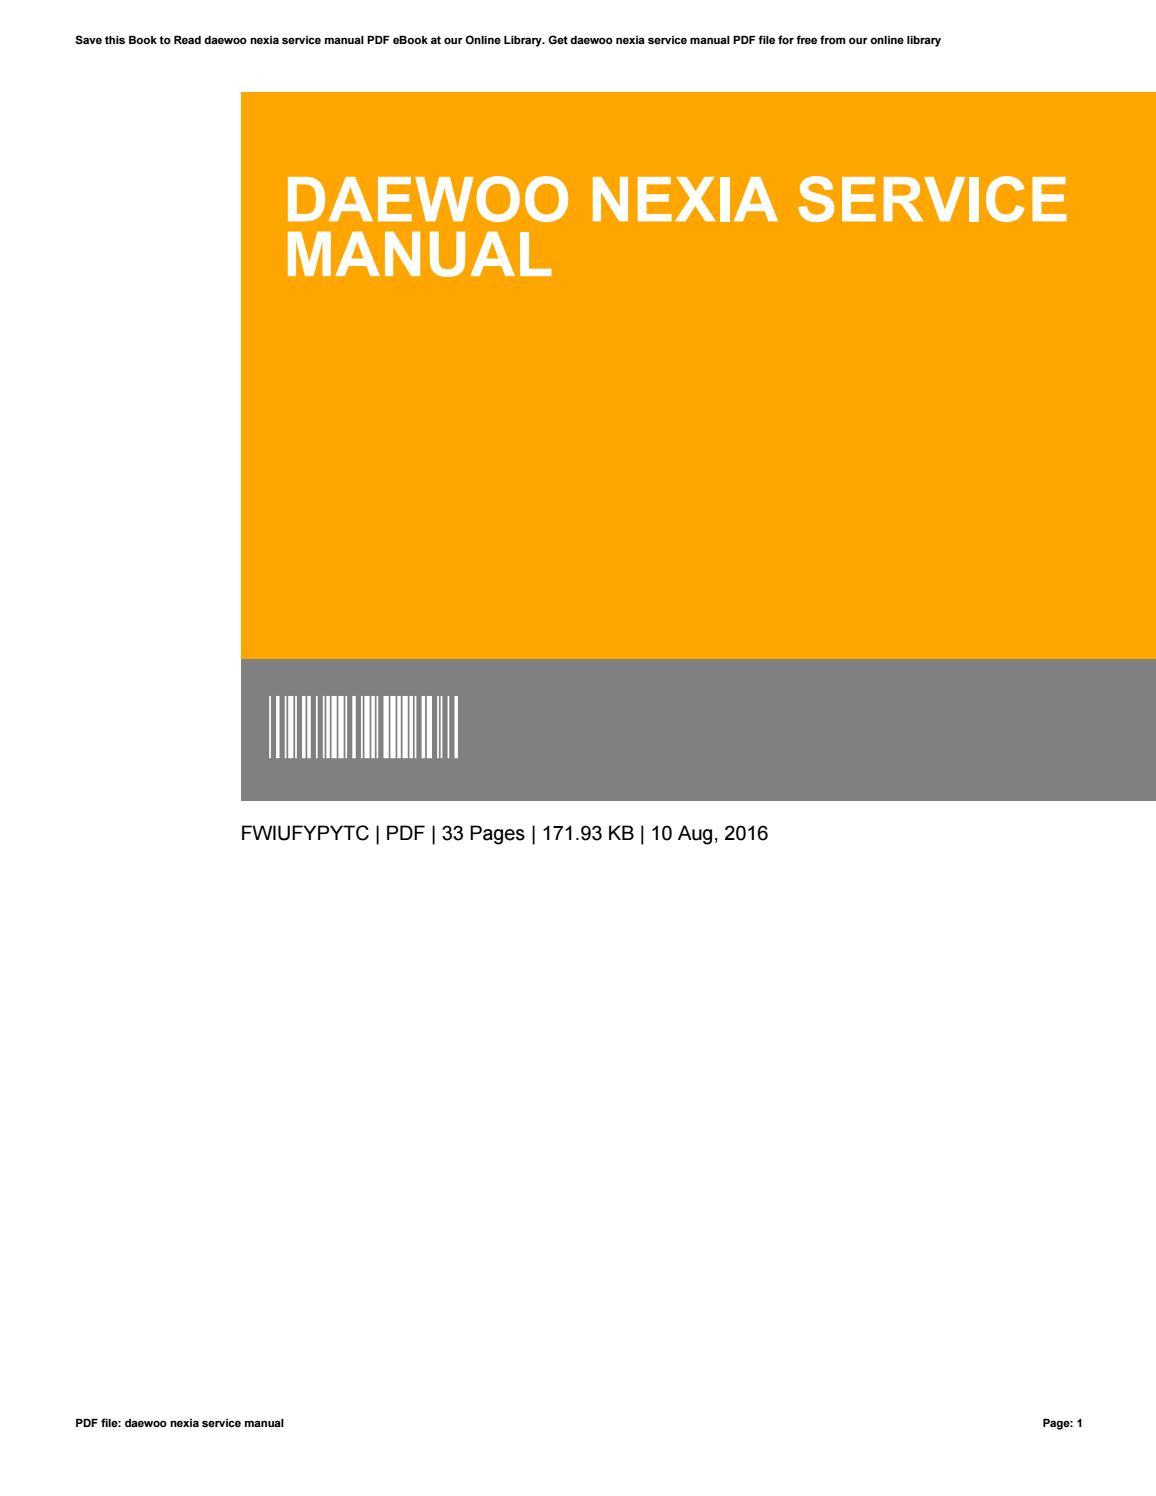 Daewoo Nexia Service Manual By Reta Phillips Issuu Cielo Pdf